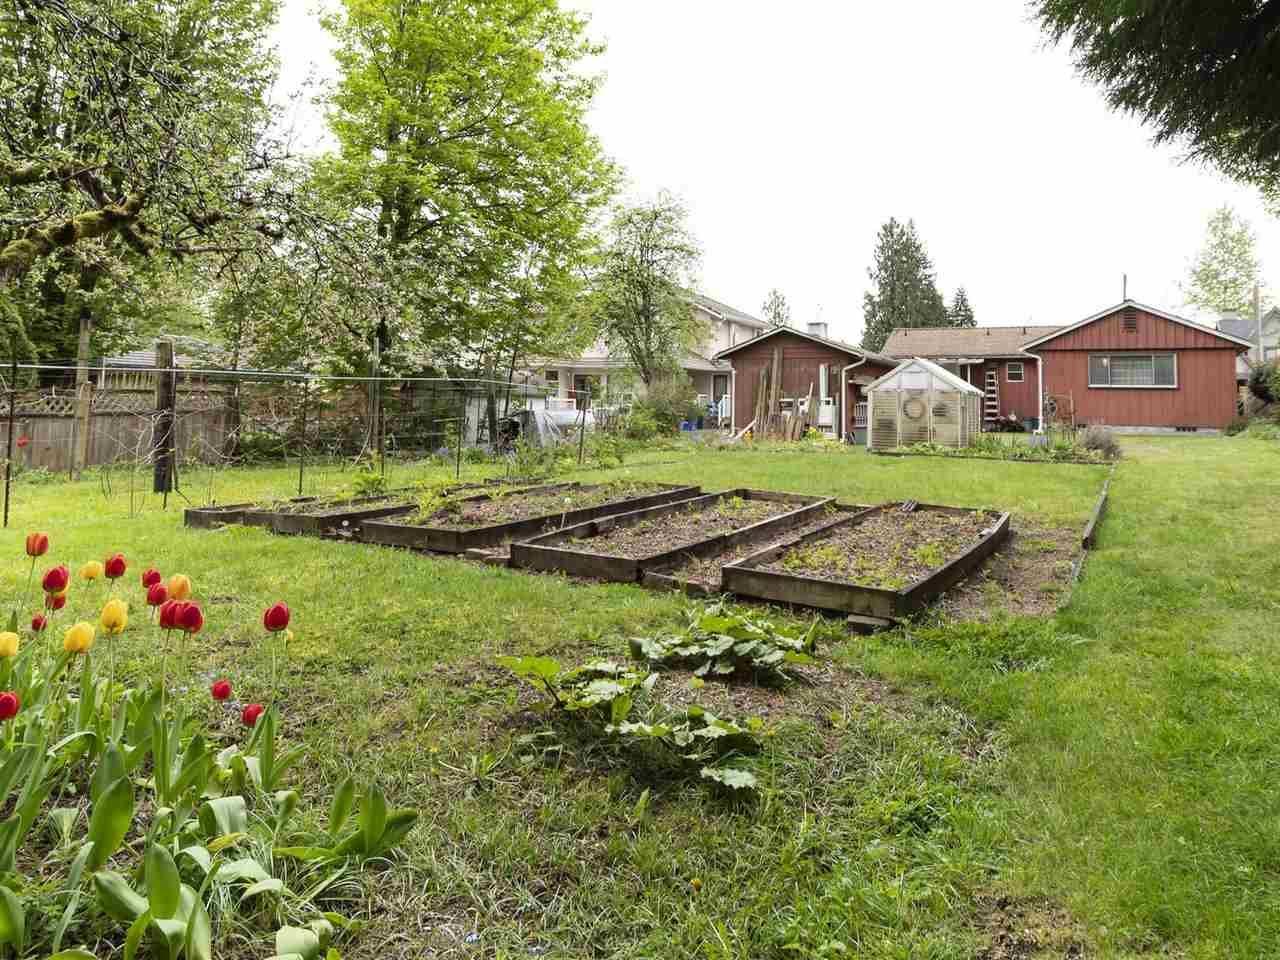 Photo 9: Photos: 1111 REGAN Avenue in Coquitlam: Central Coquitlam House for sale : MLS®# R2452577